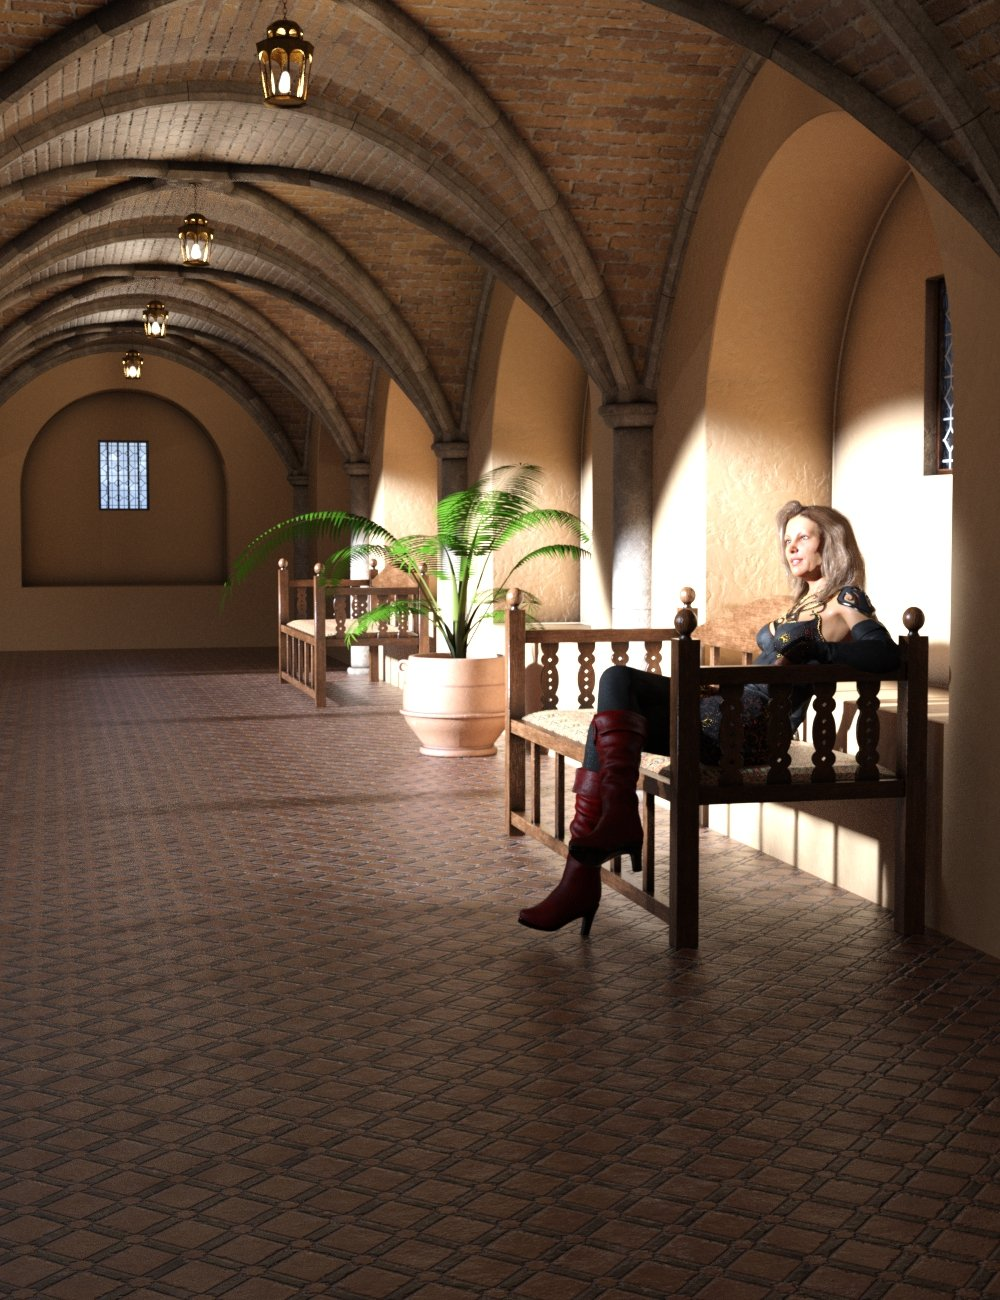 Modular Moroccan Building Set by: TangoAlpha, 3D Models by Daz 3D